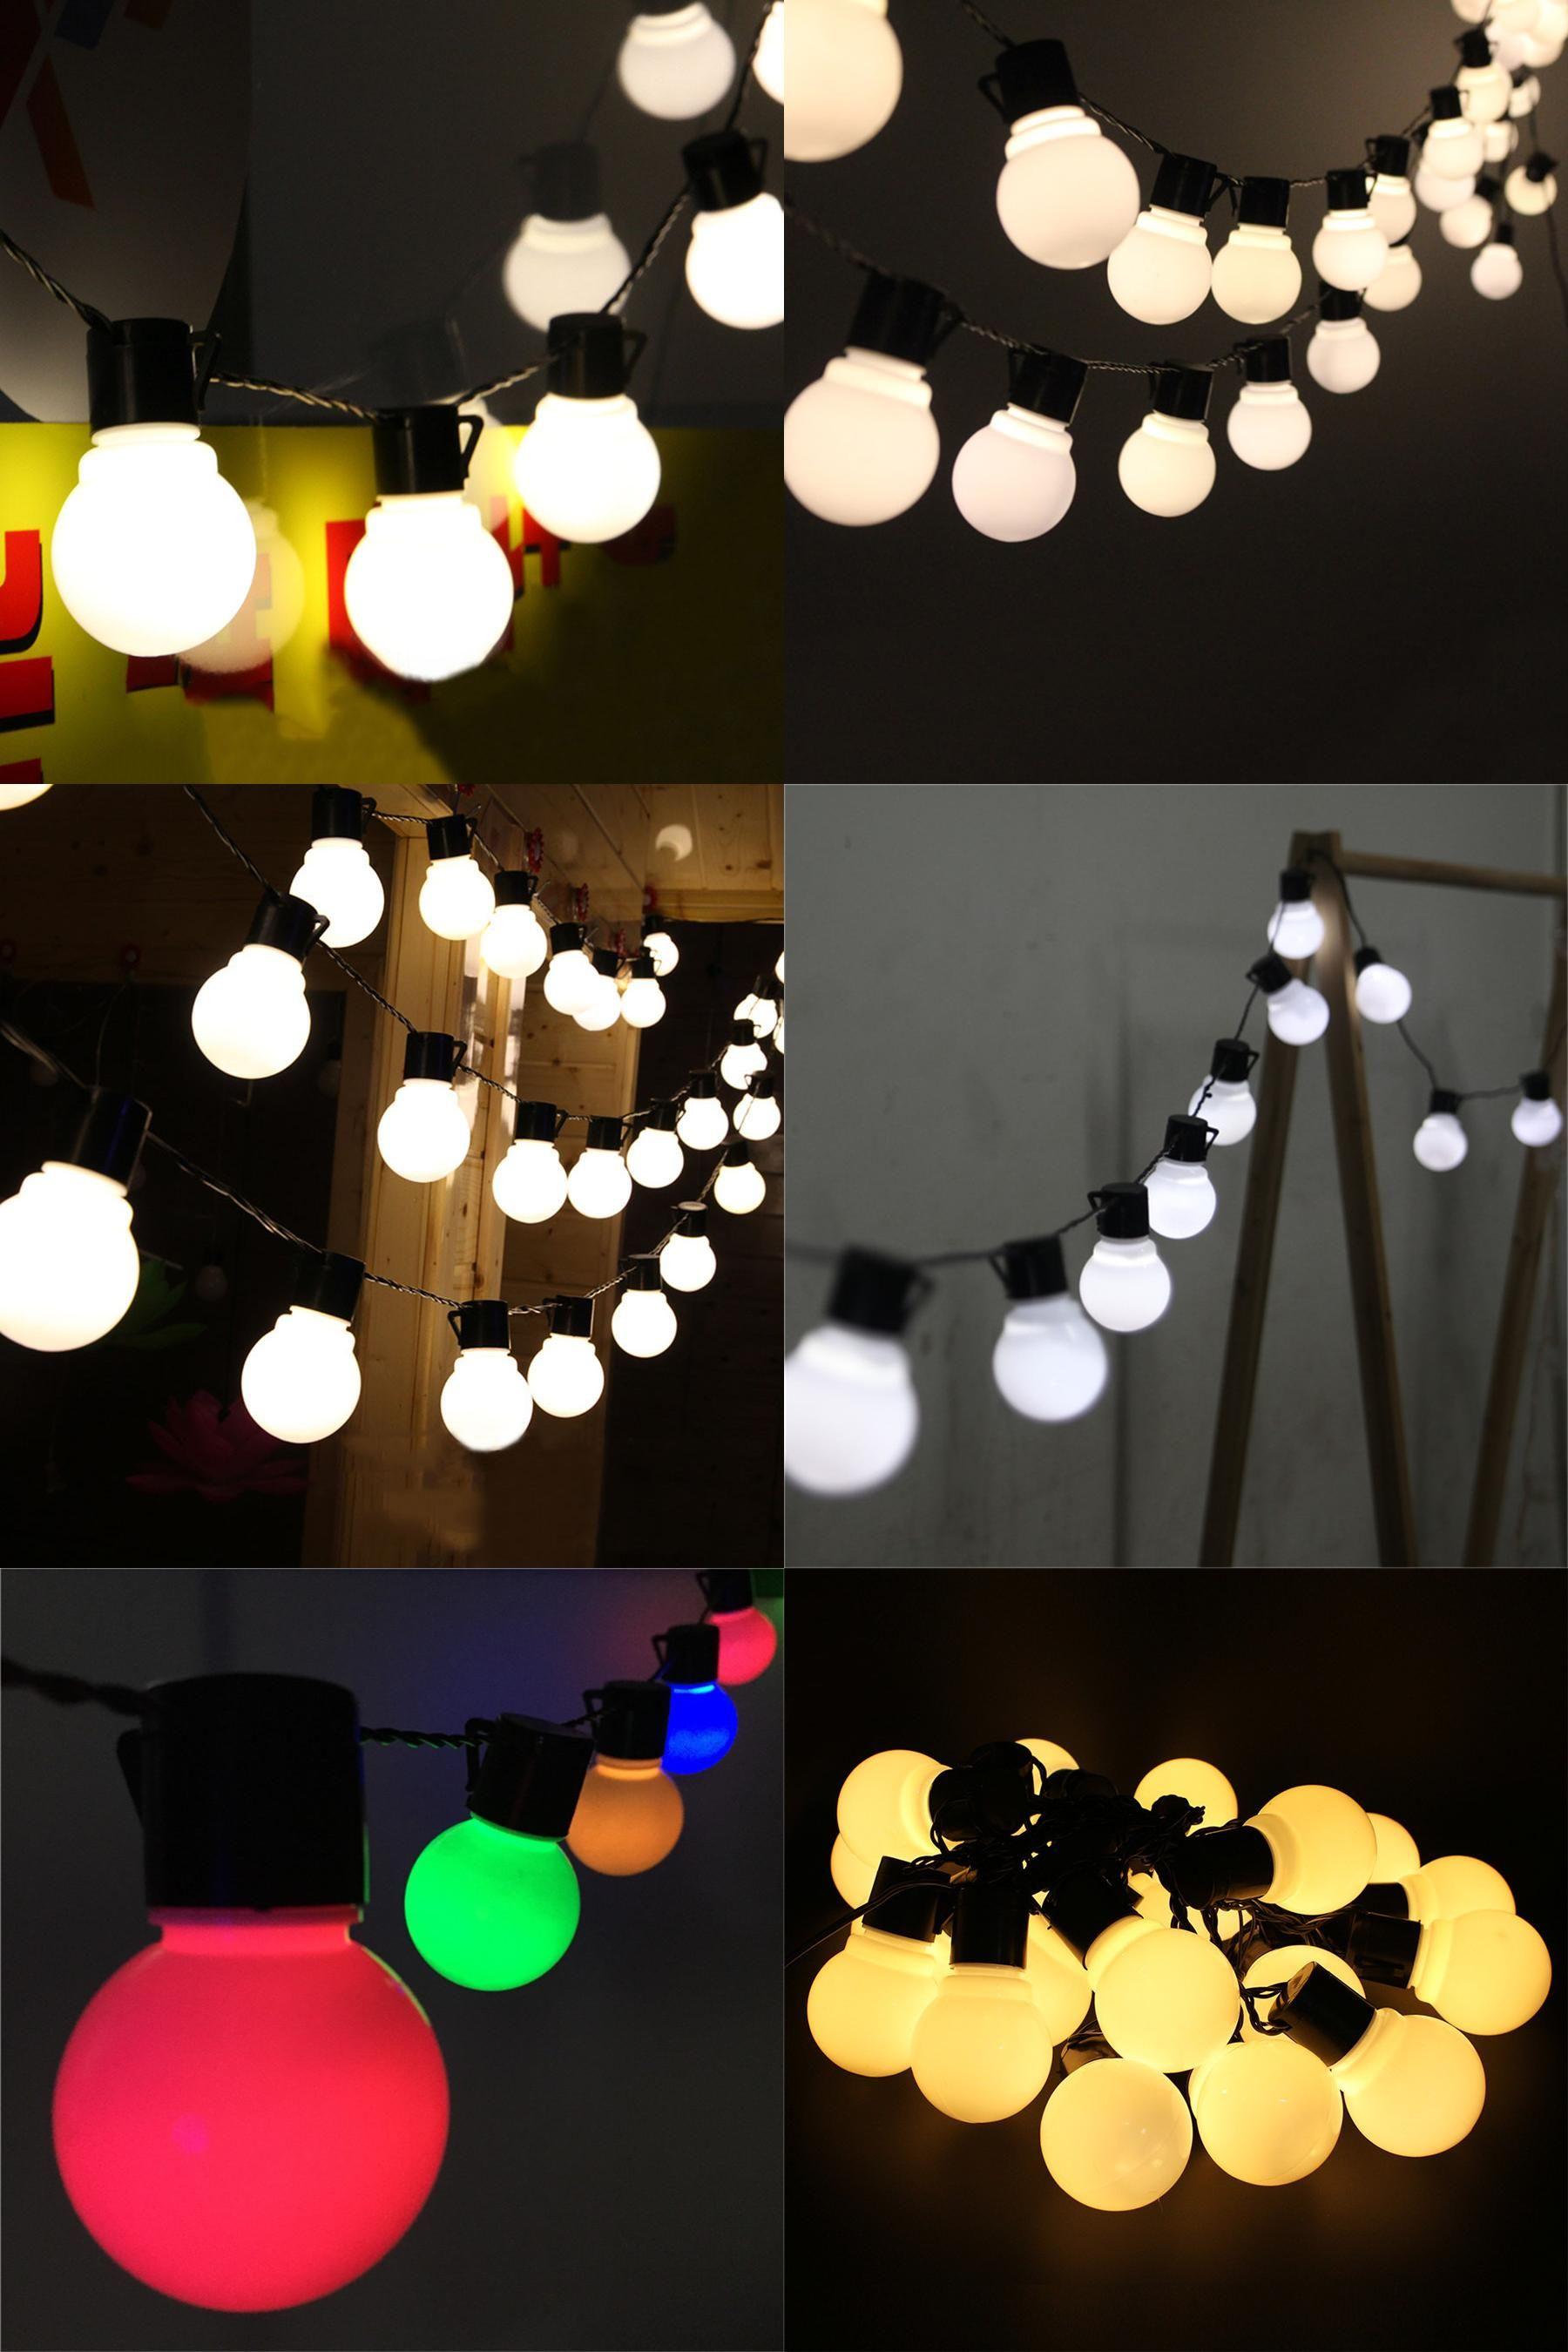 Visit to Buy] Thrisdar 5CM Outdoor Globe Ball Led String Lights 5M